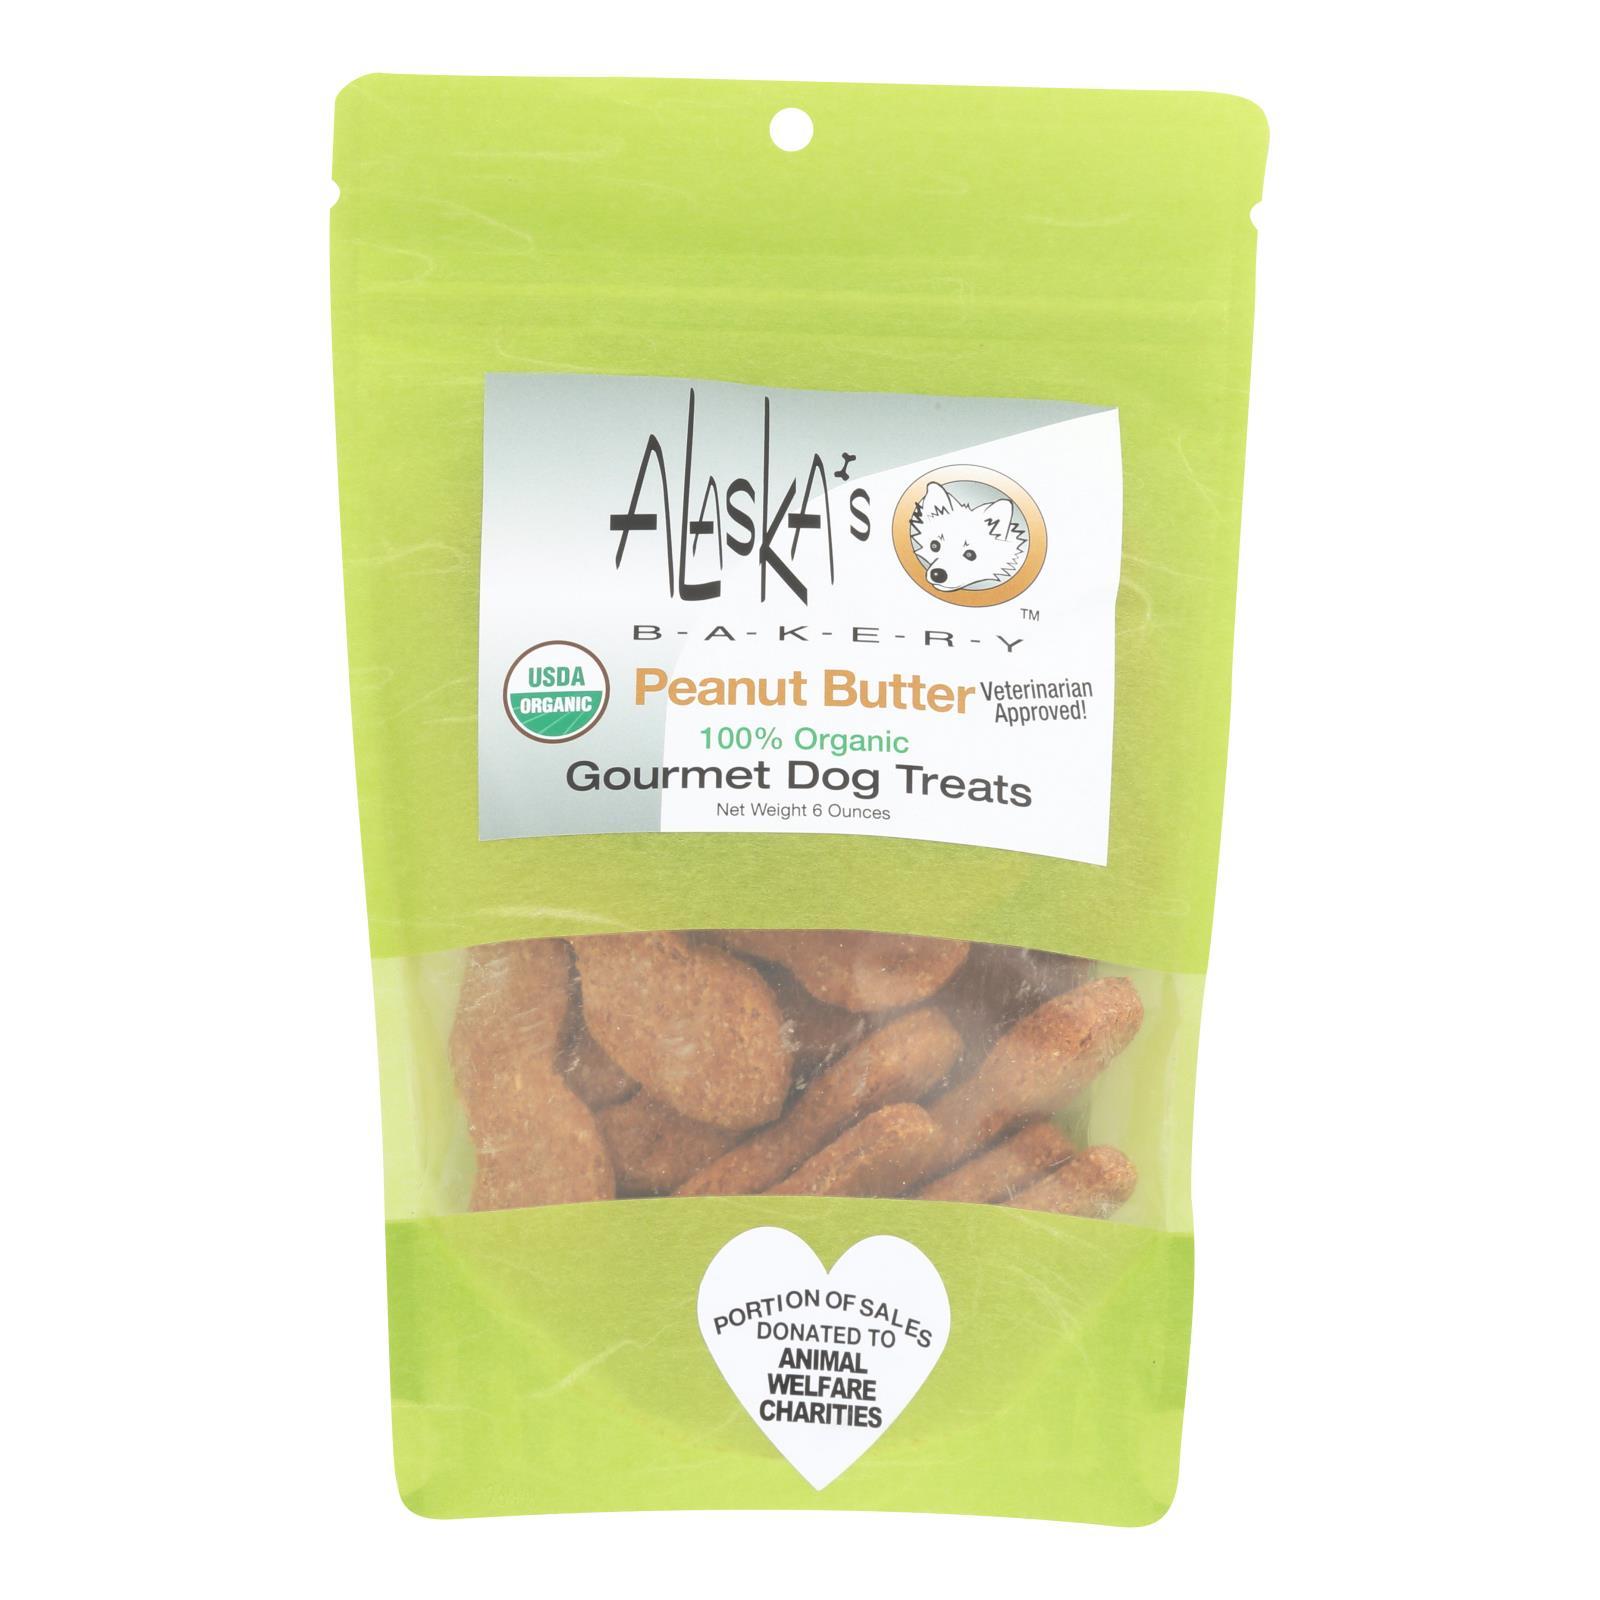 Alaska's Bakery - Dog Treats - Peanut Butter - Case of 6 - 6 oz.